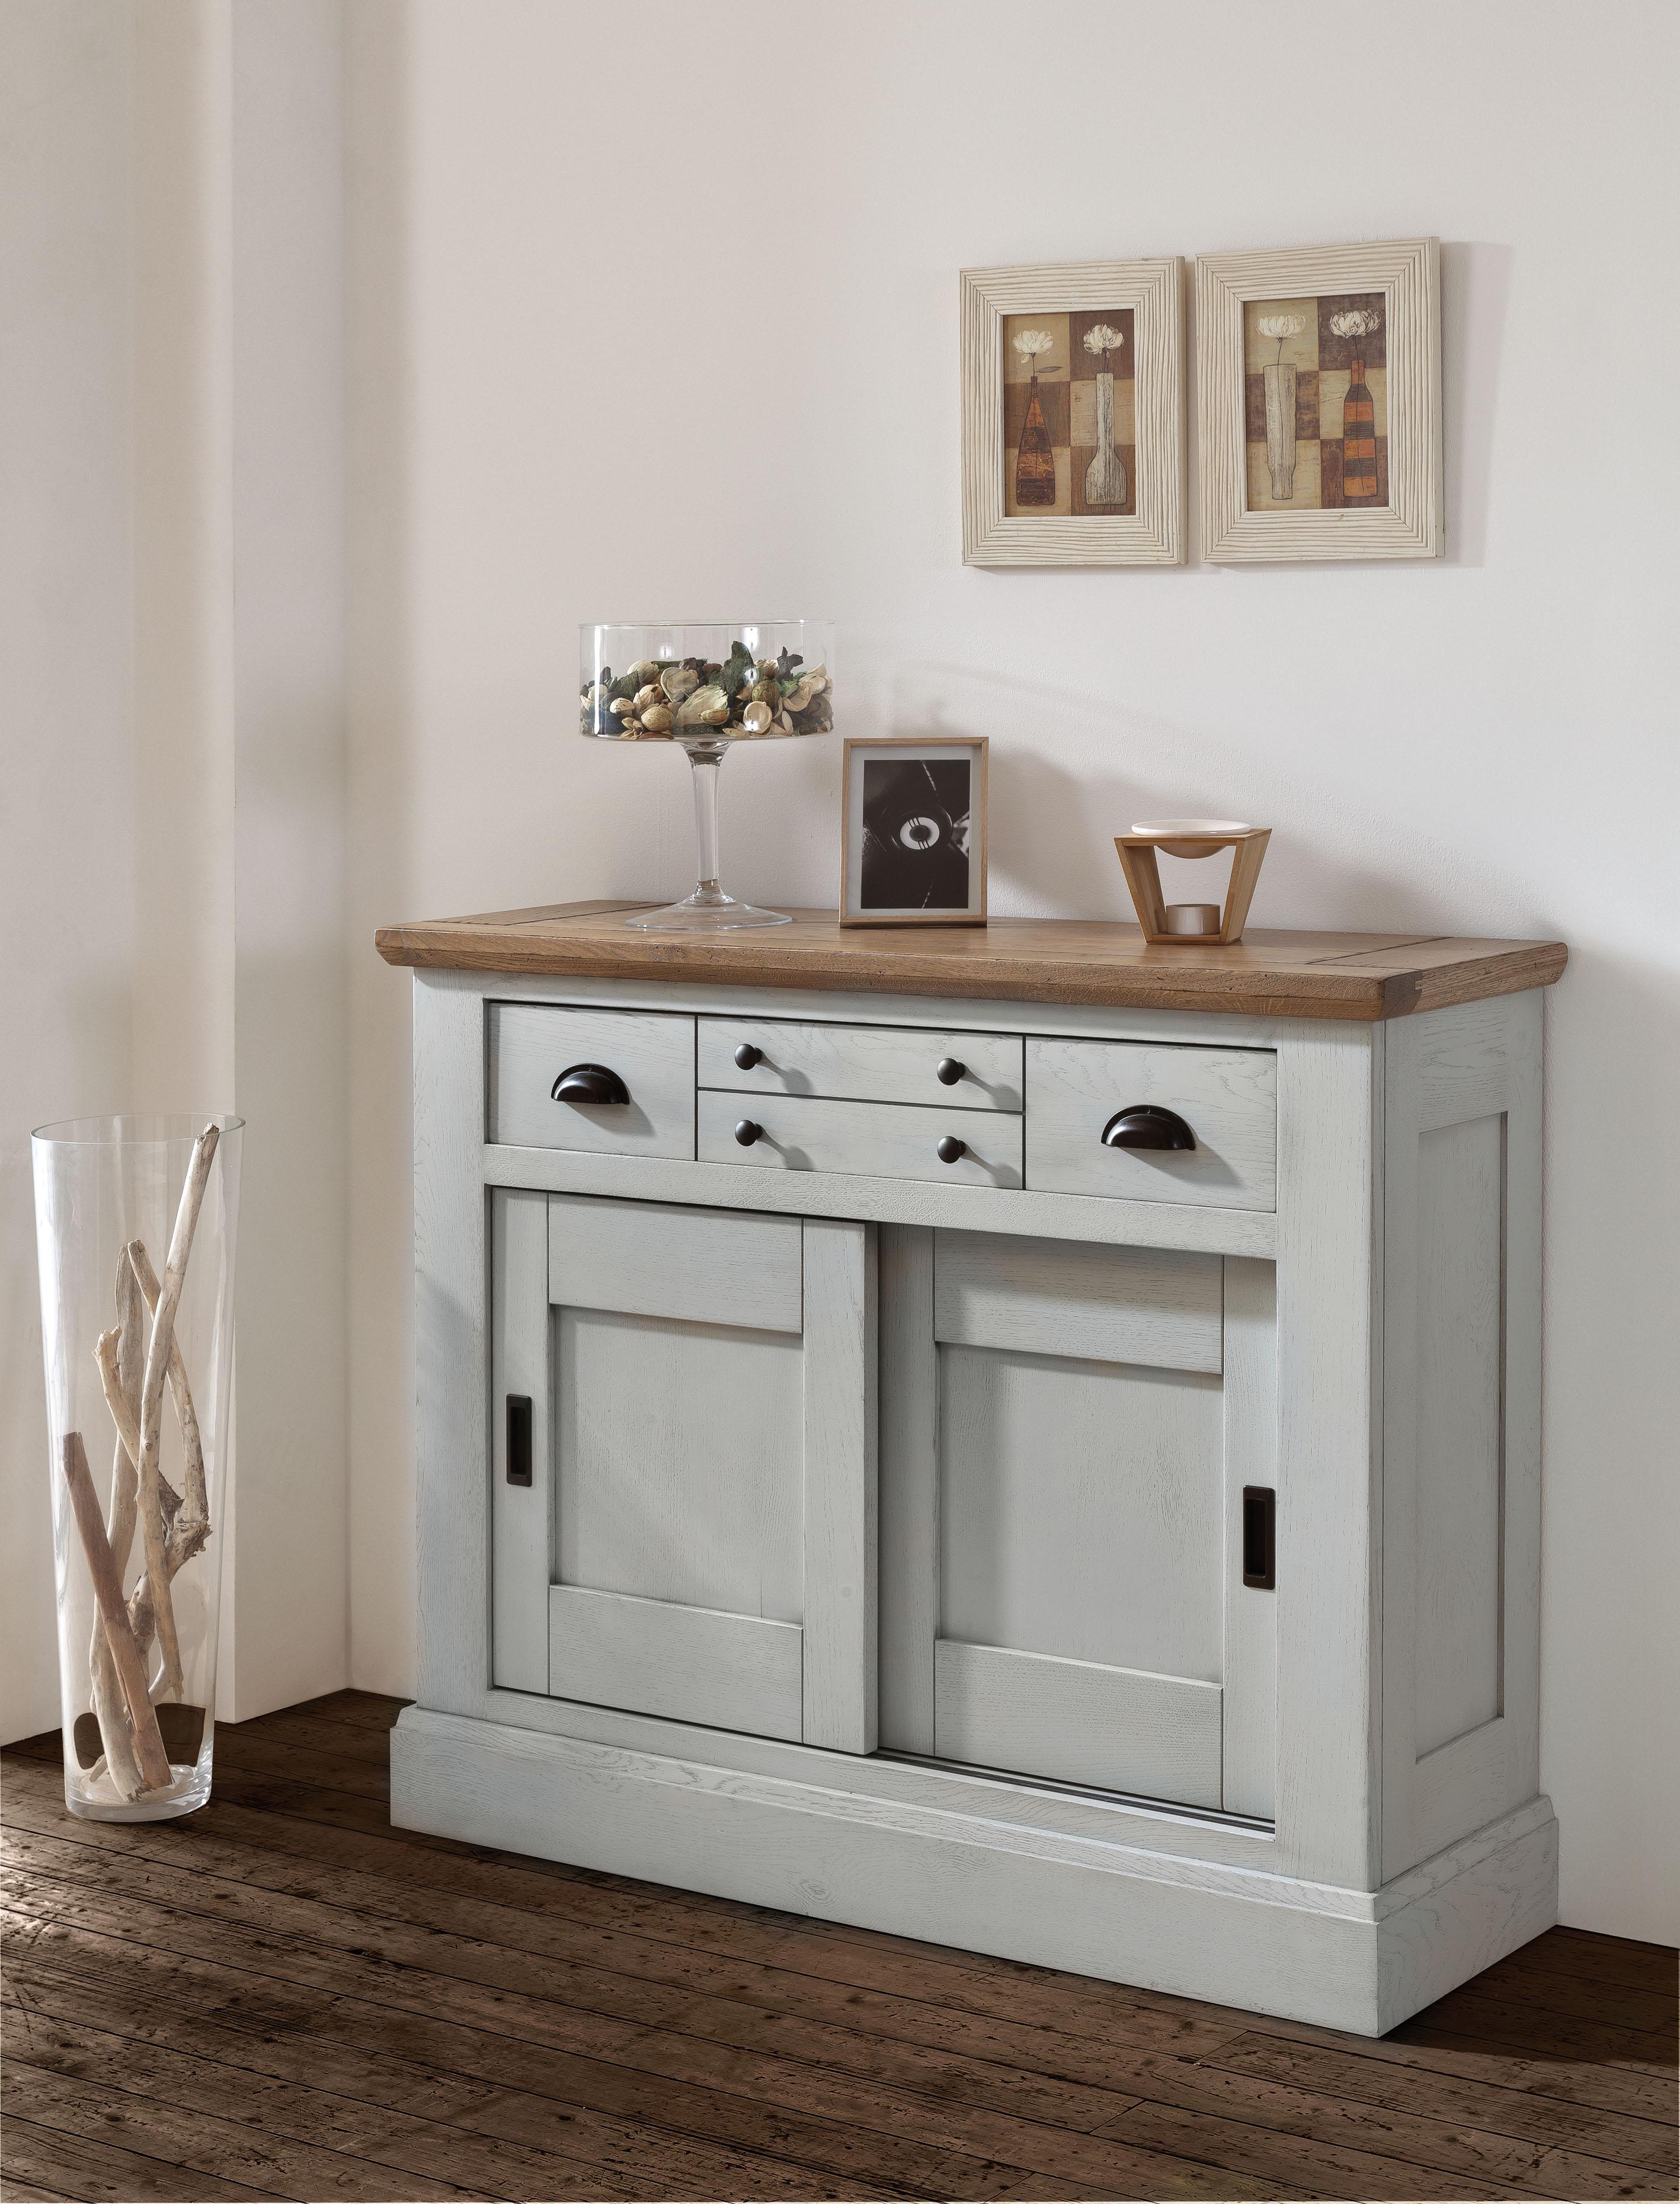 meuble dentree romance 2 portes et 1 tiroir ro921. Black Bedroom Furniture Sets. Home Design Ideas